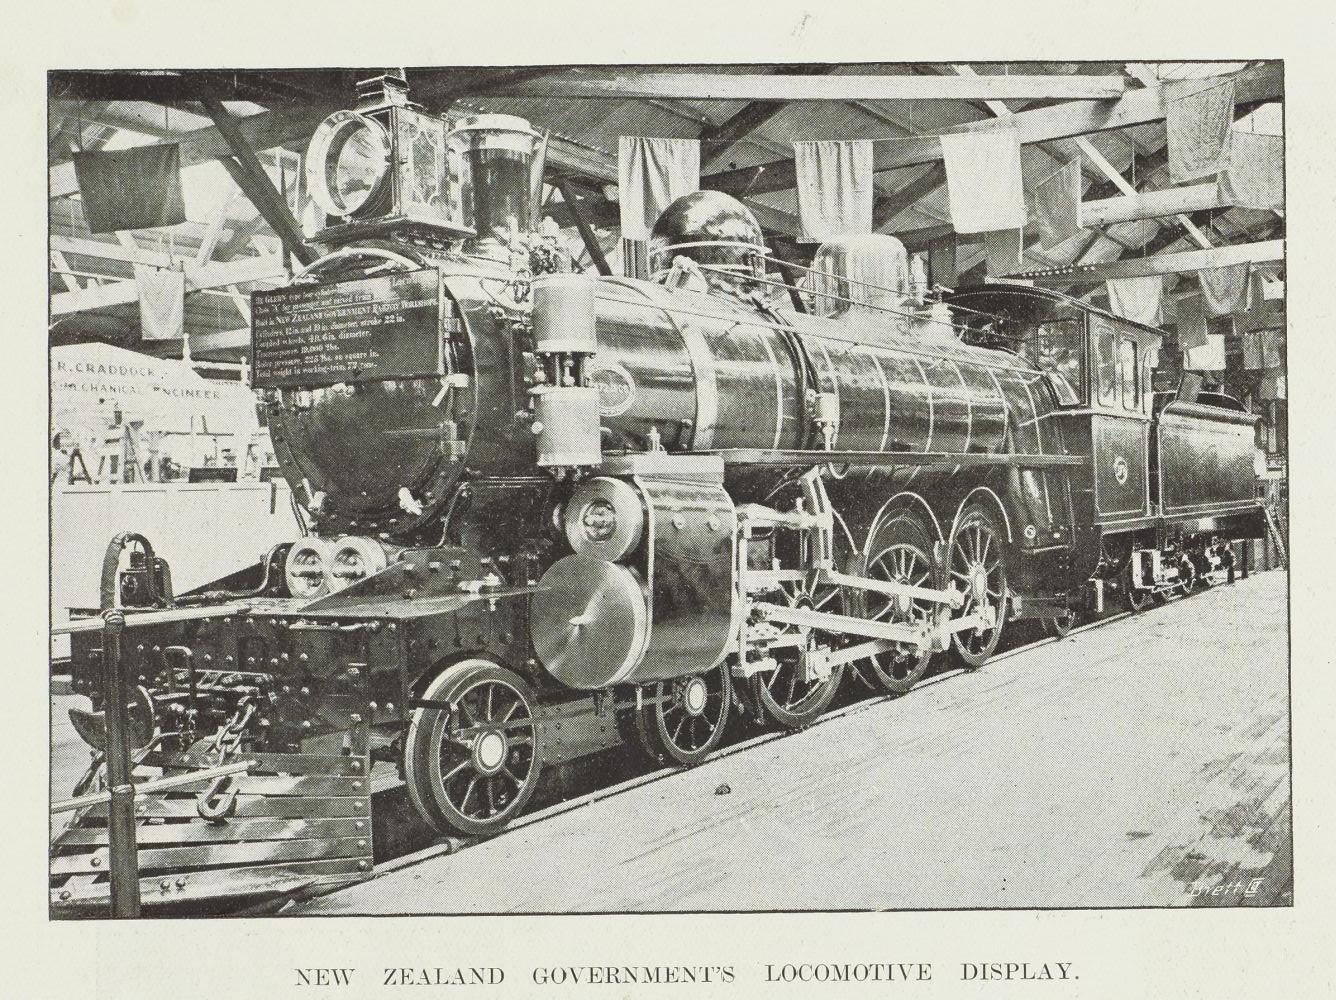 New Zealand Government's locomotive display